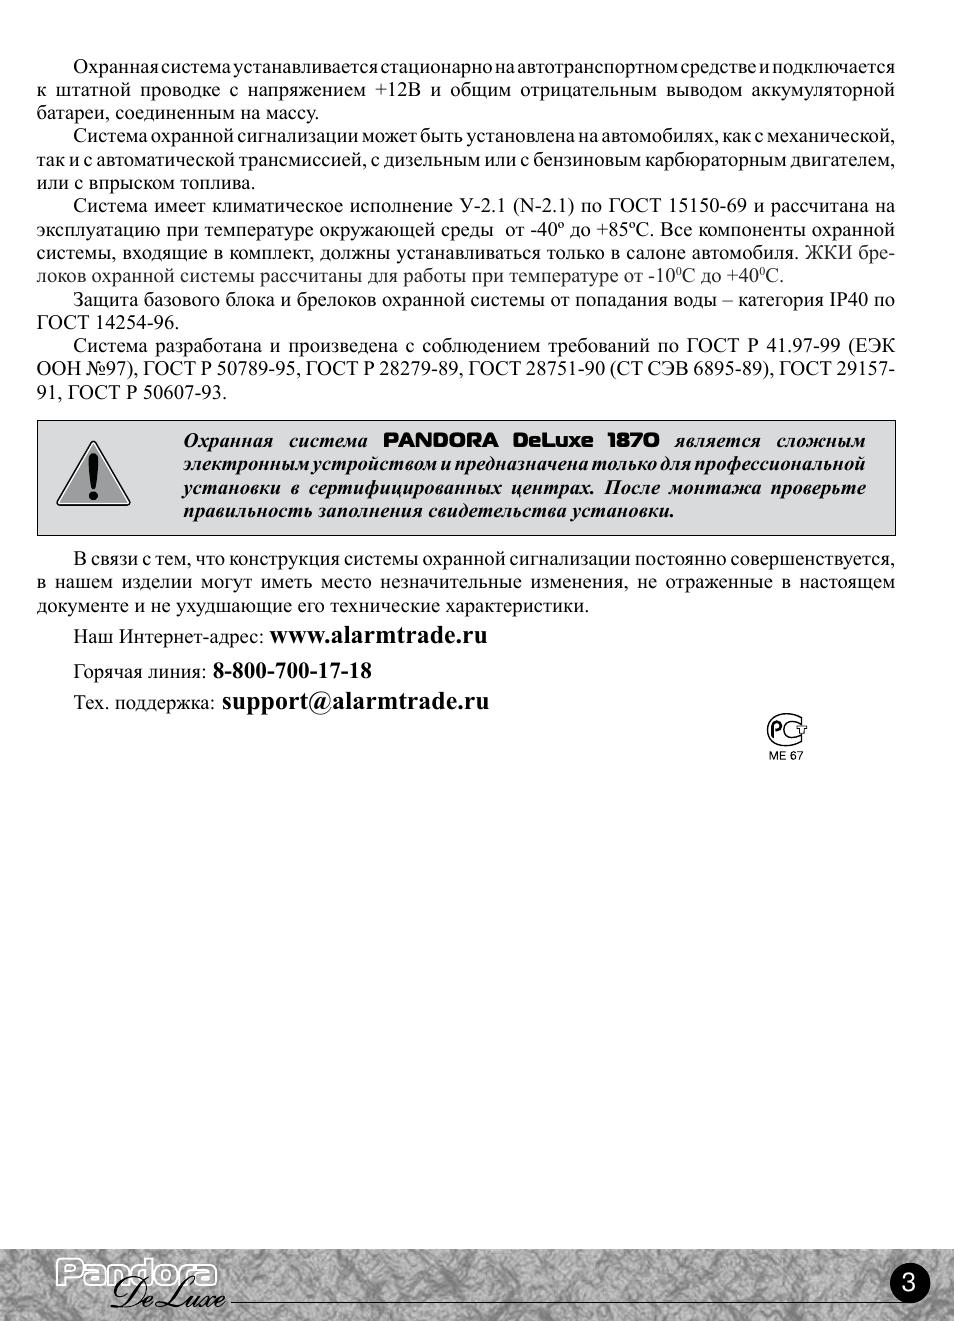 Support@alarmtrade.ru